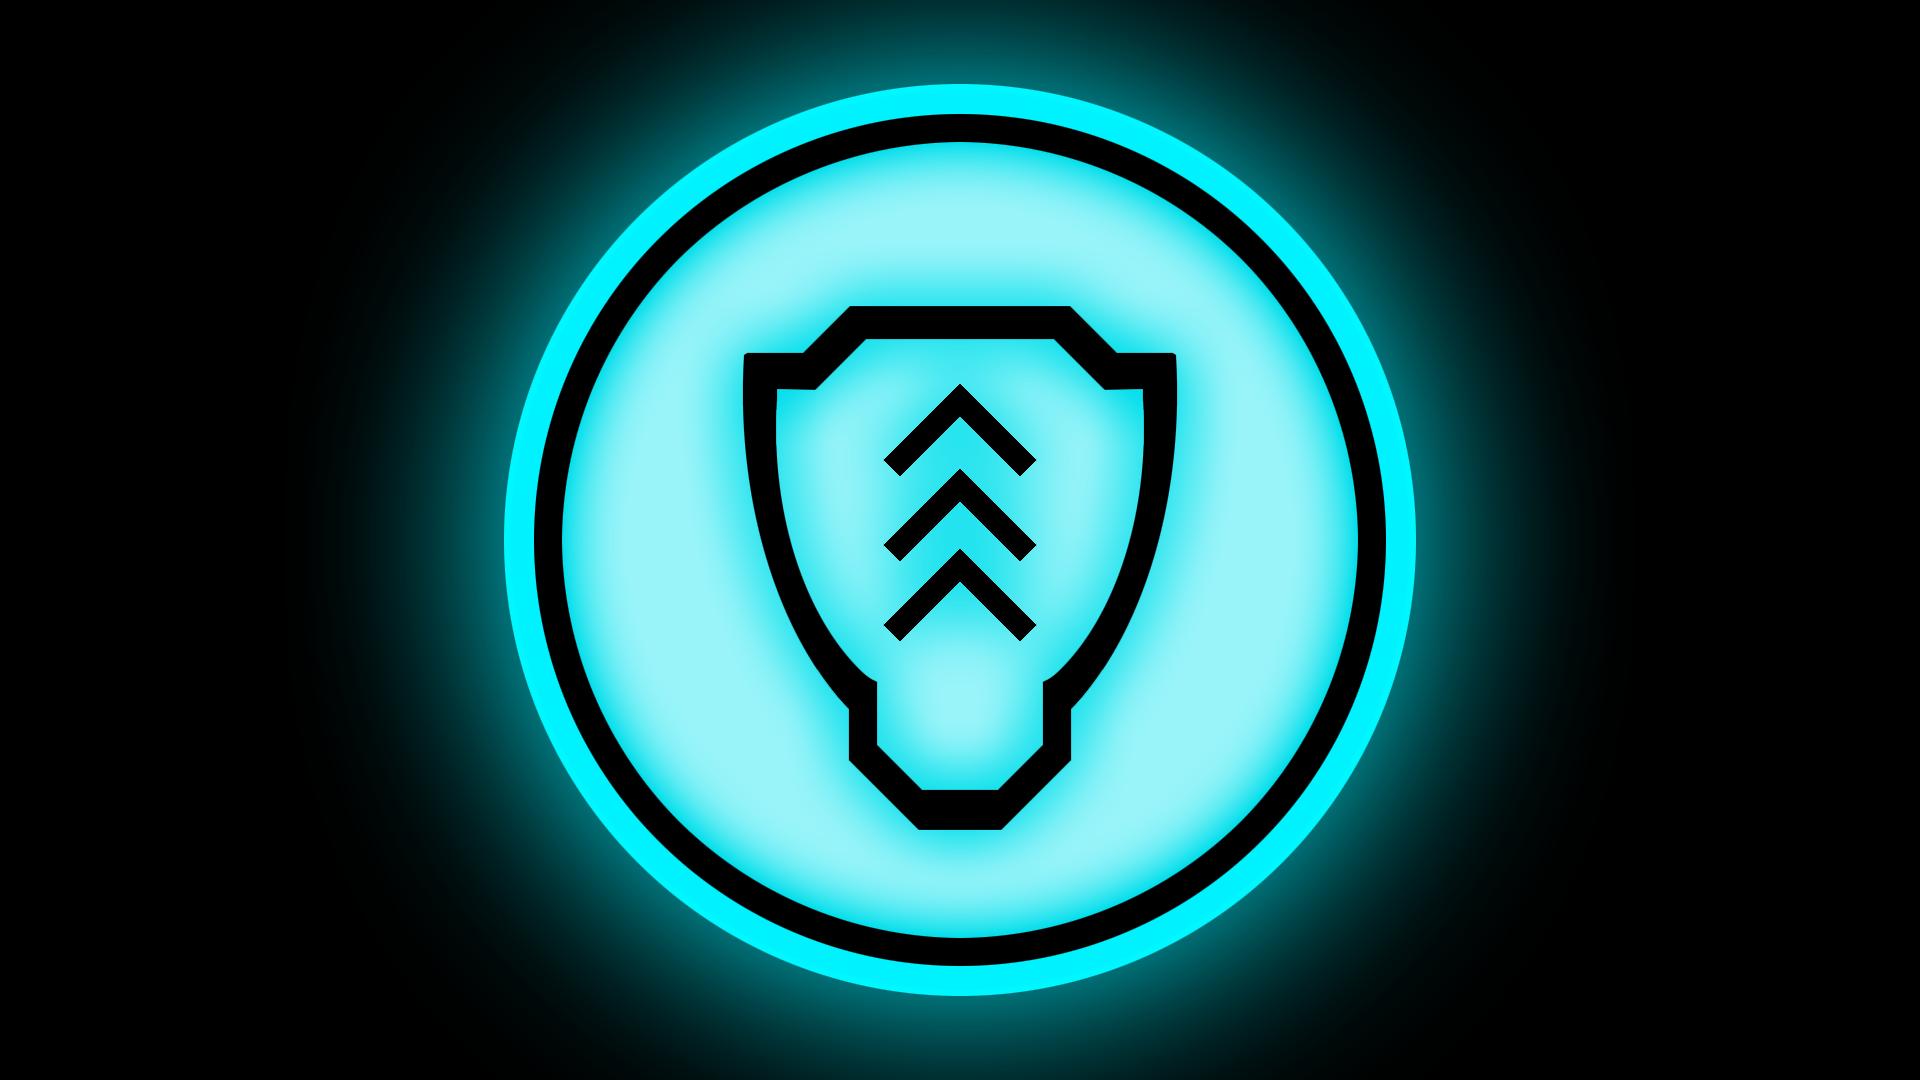 Xbox Halo Spartan Assault Achievements Find Your Xbox Achievements